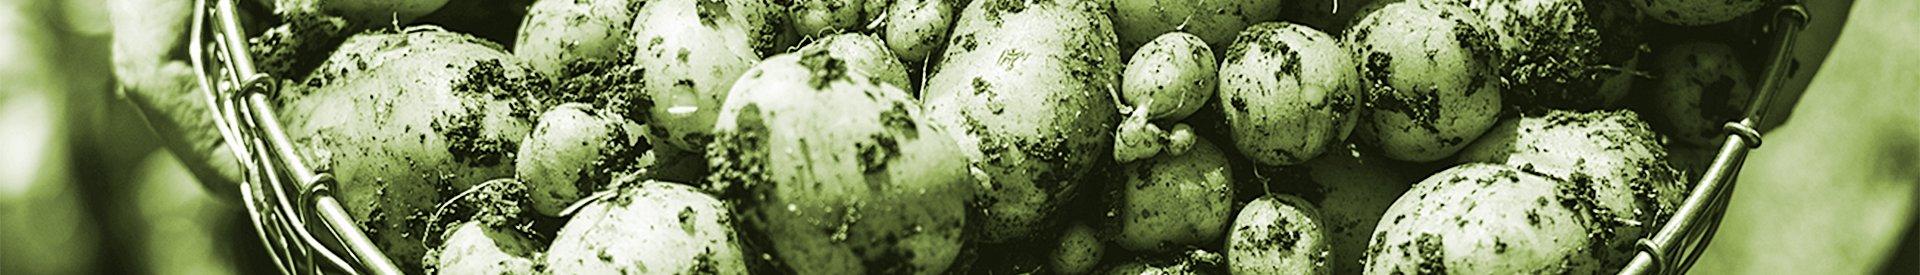 kartoffeln_gruen